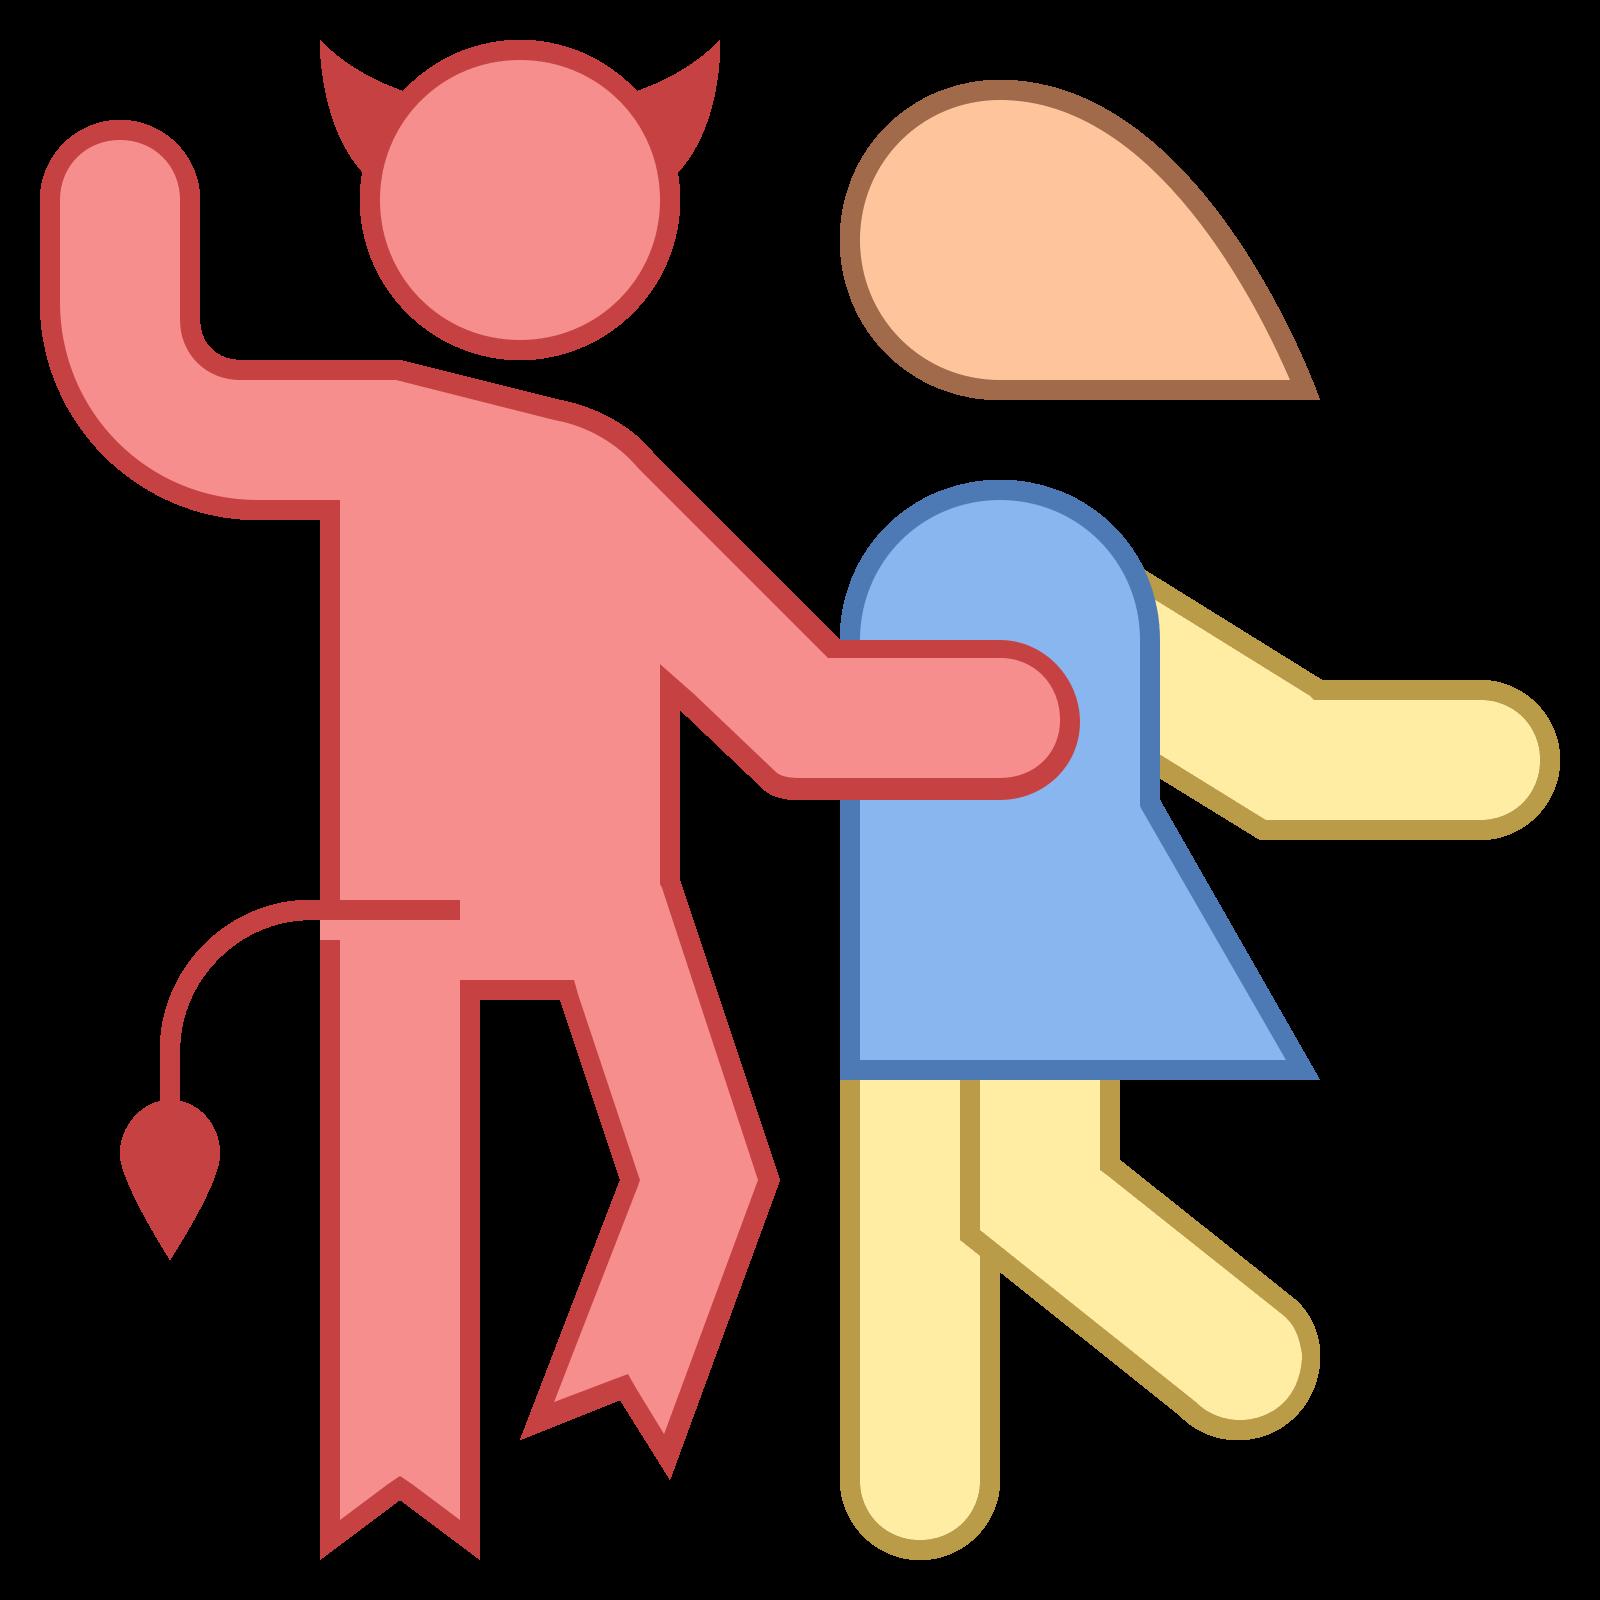 Dance with icon kostenloser. Devil clipart hoof